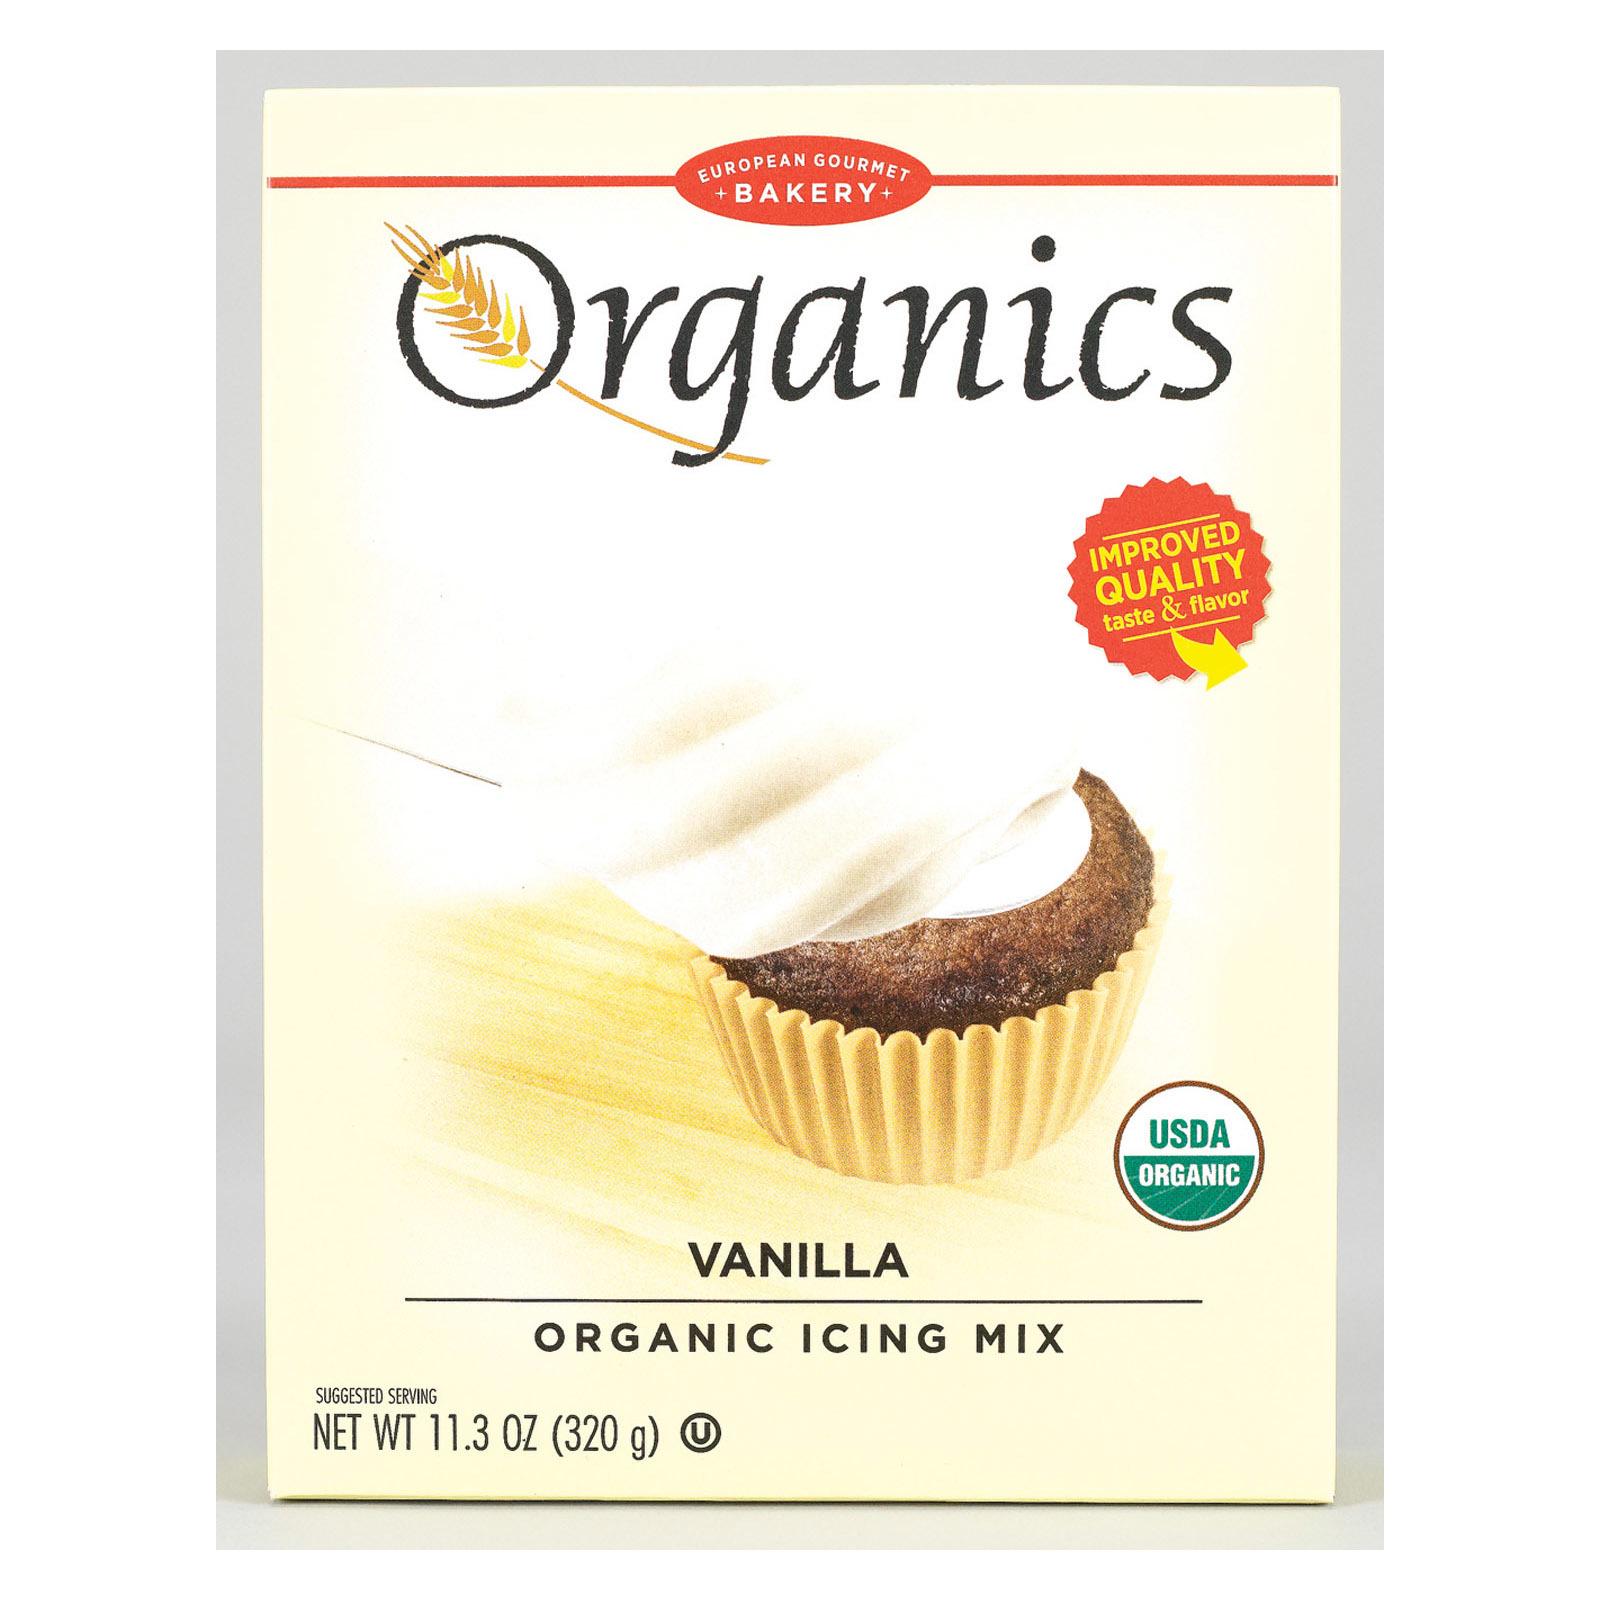 European Gourmet Bakery Organic Vanilla Icing Mix - Vanilla - Case of 12 - 11.3 oz.